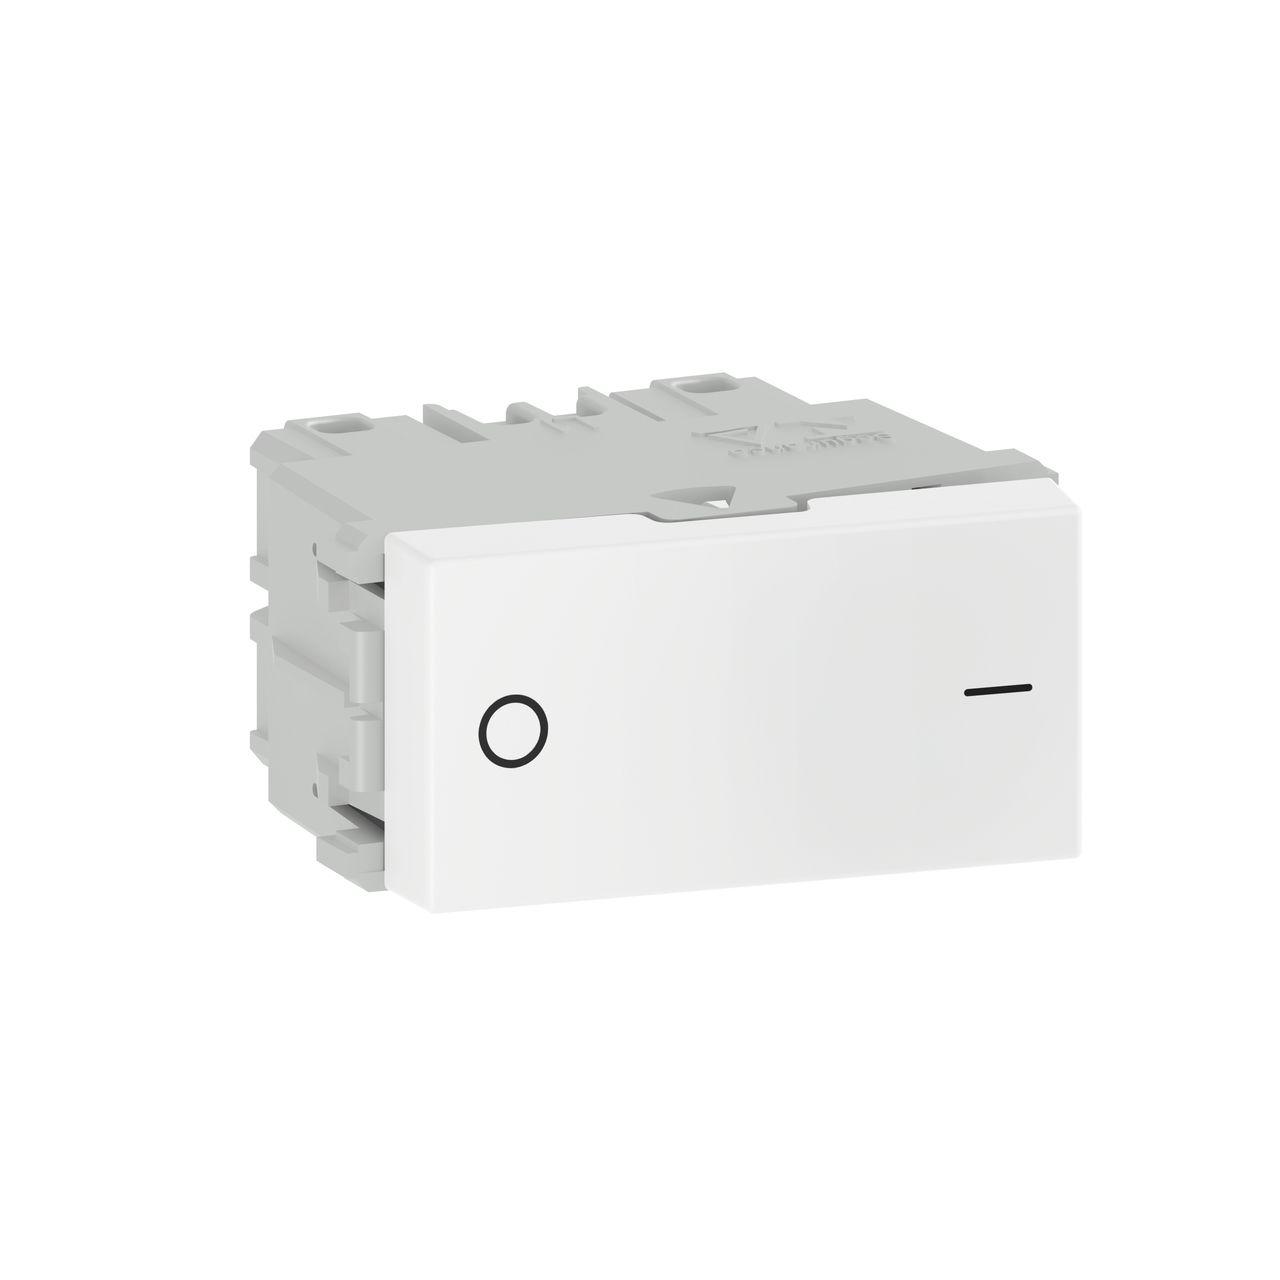 INTERRUPTOR BIPOLAR SIMPLES 10A/250V REFINATTO